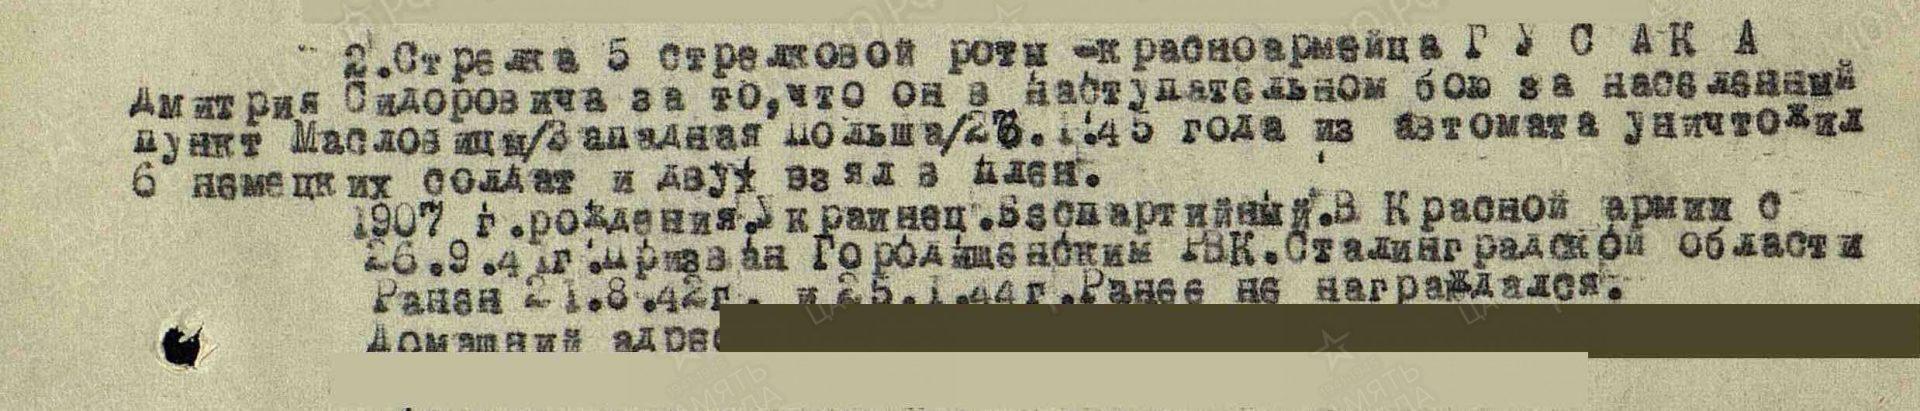 Гусак Дмитрий Сидорович